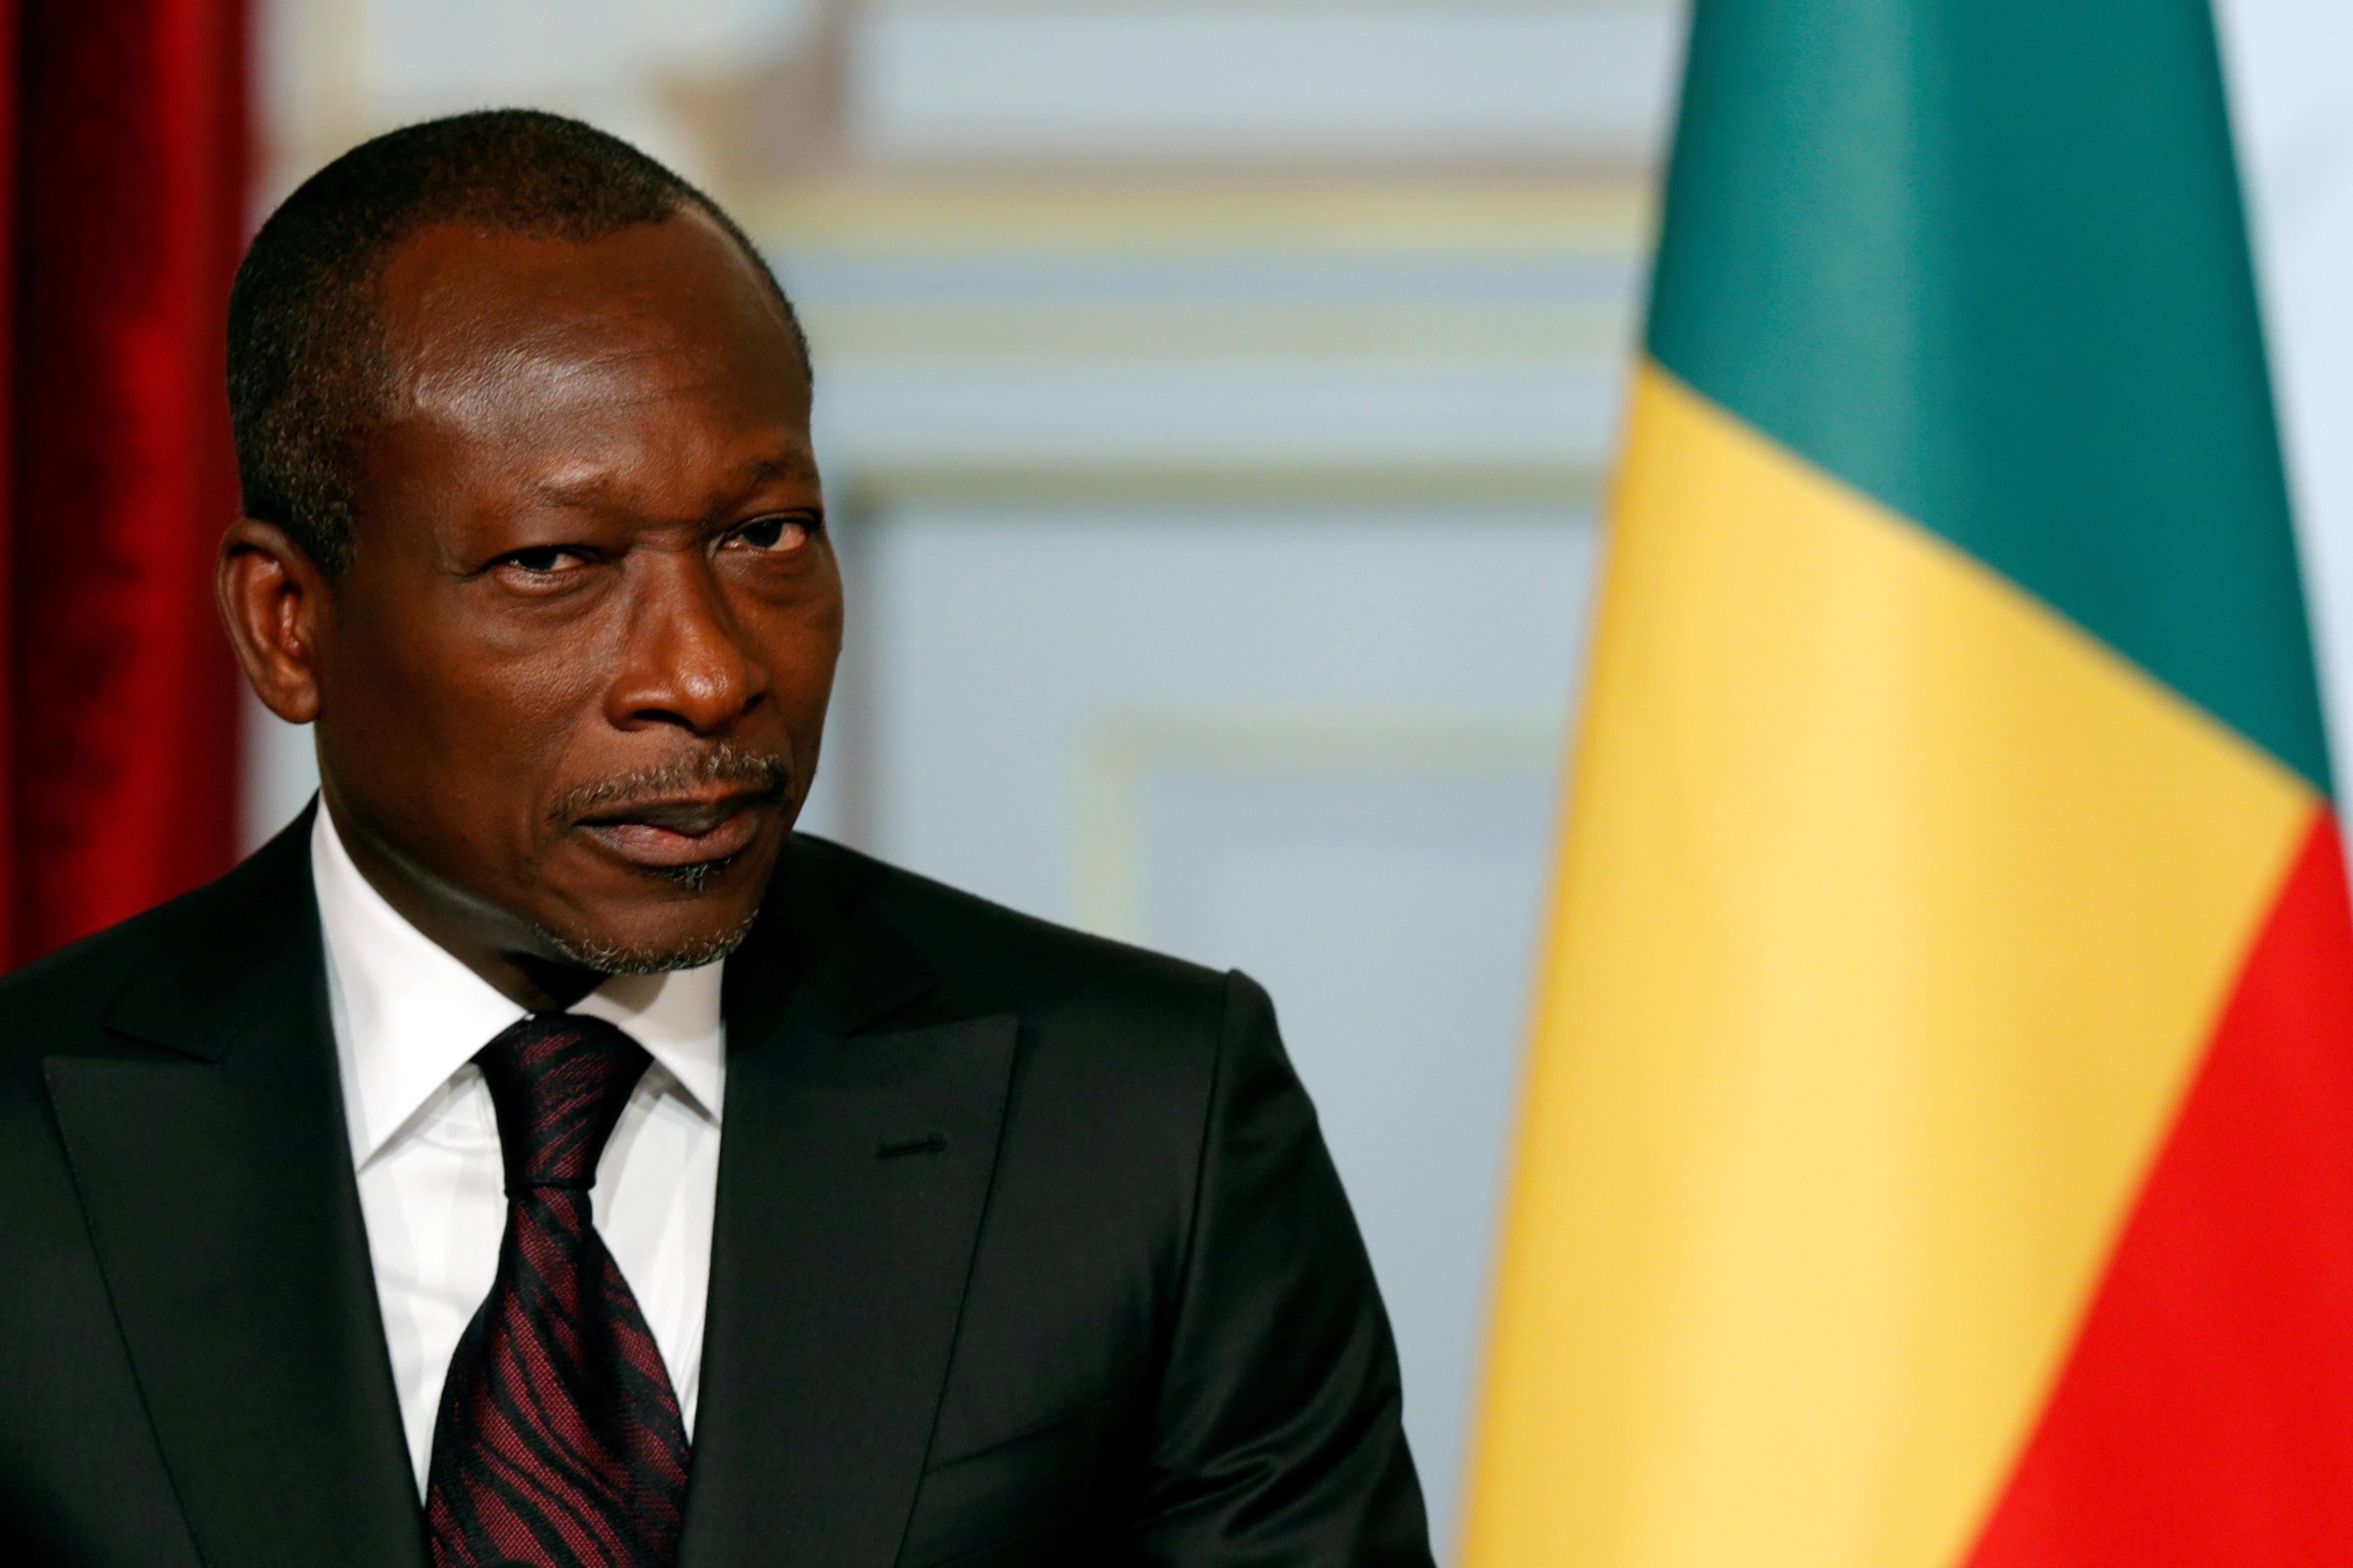 Benin's President Patrice Talon. REUTERS/Philippe Wojazer